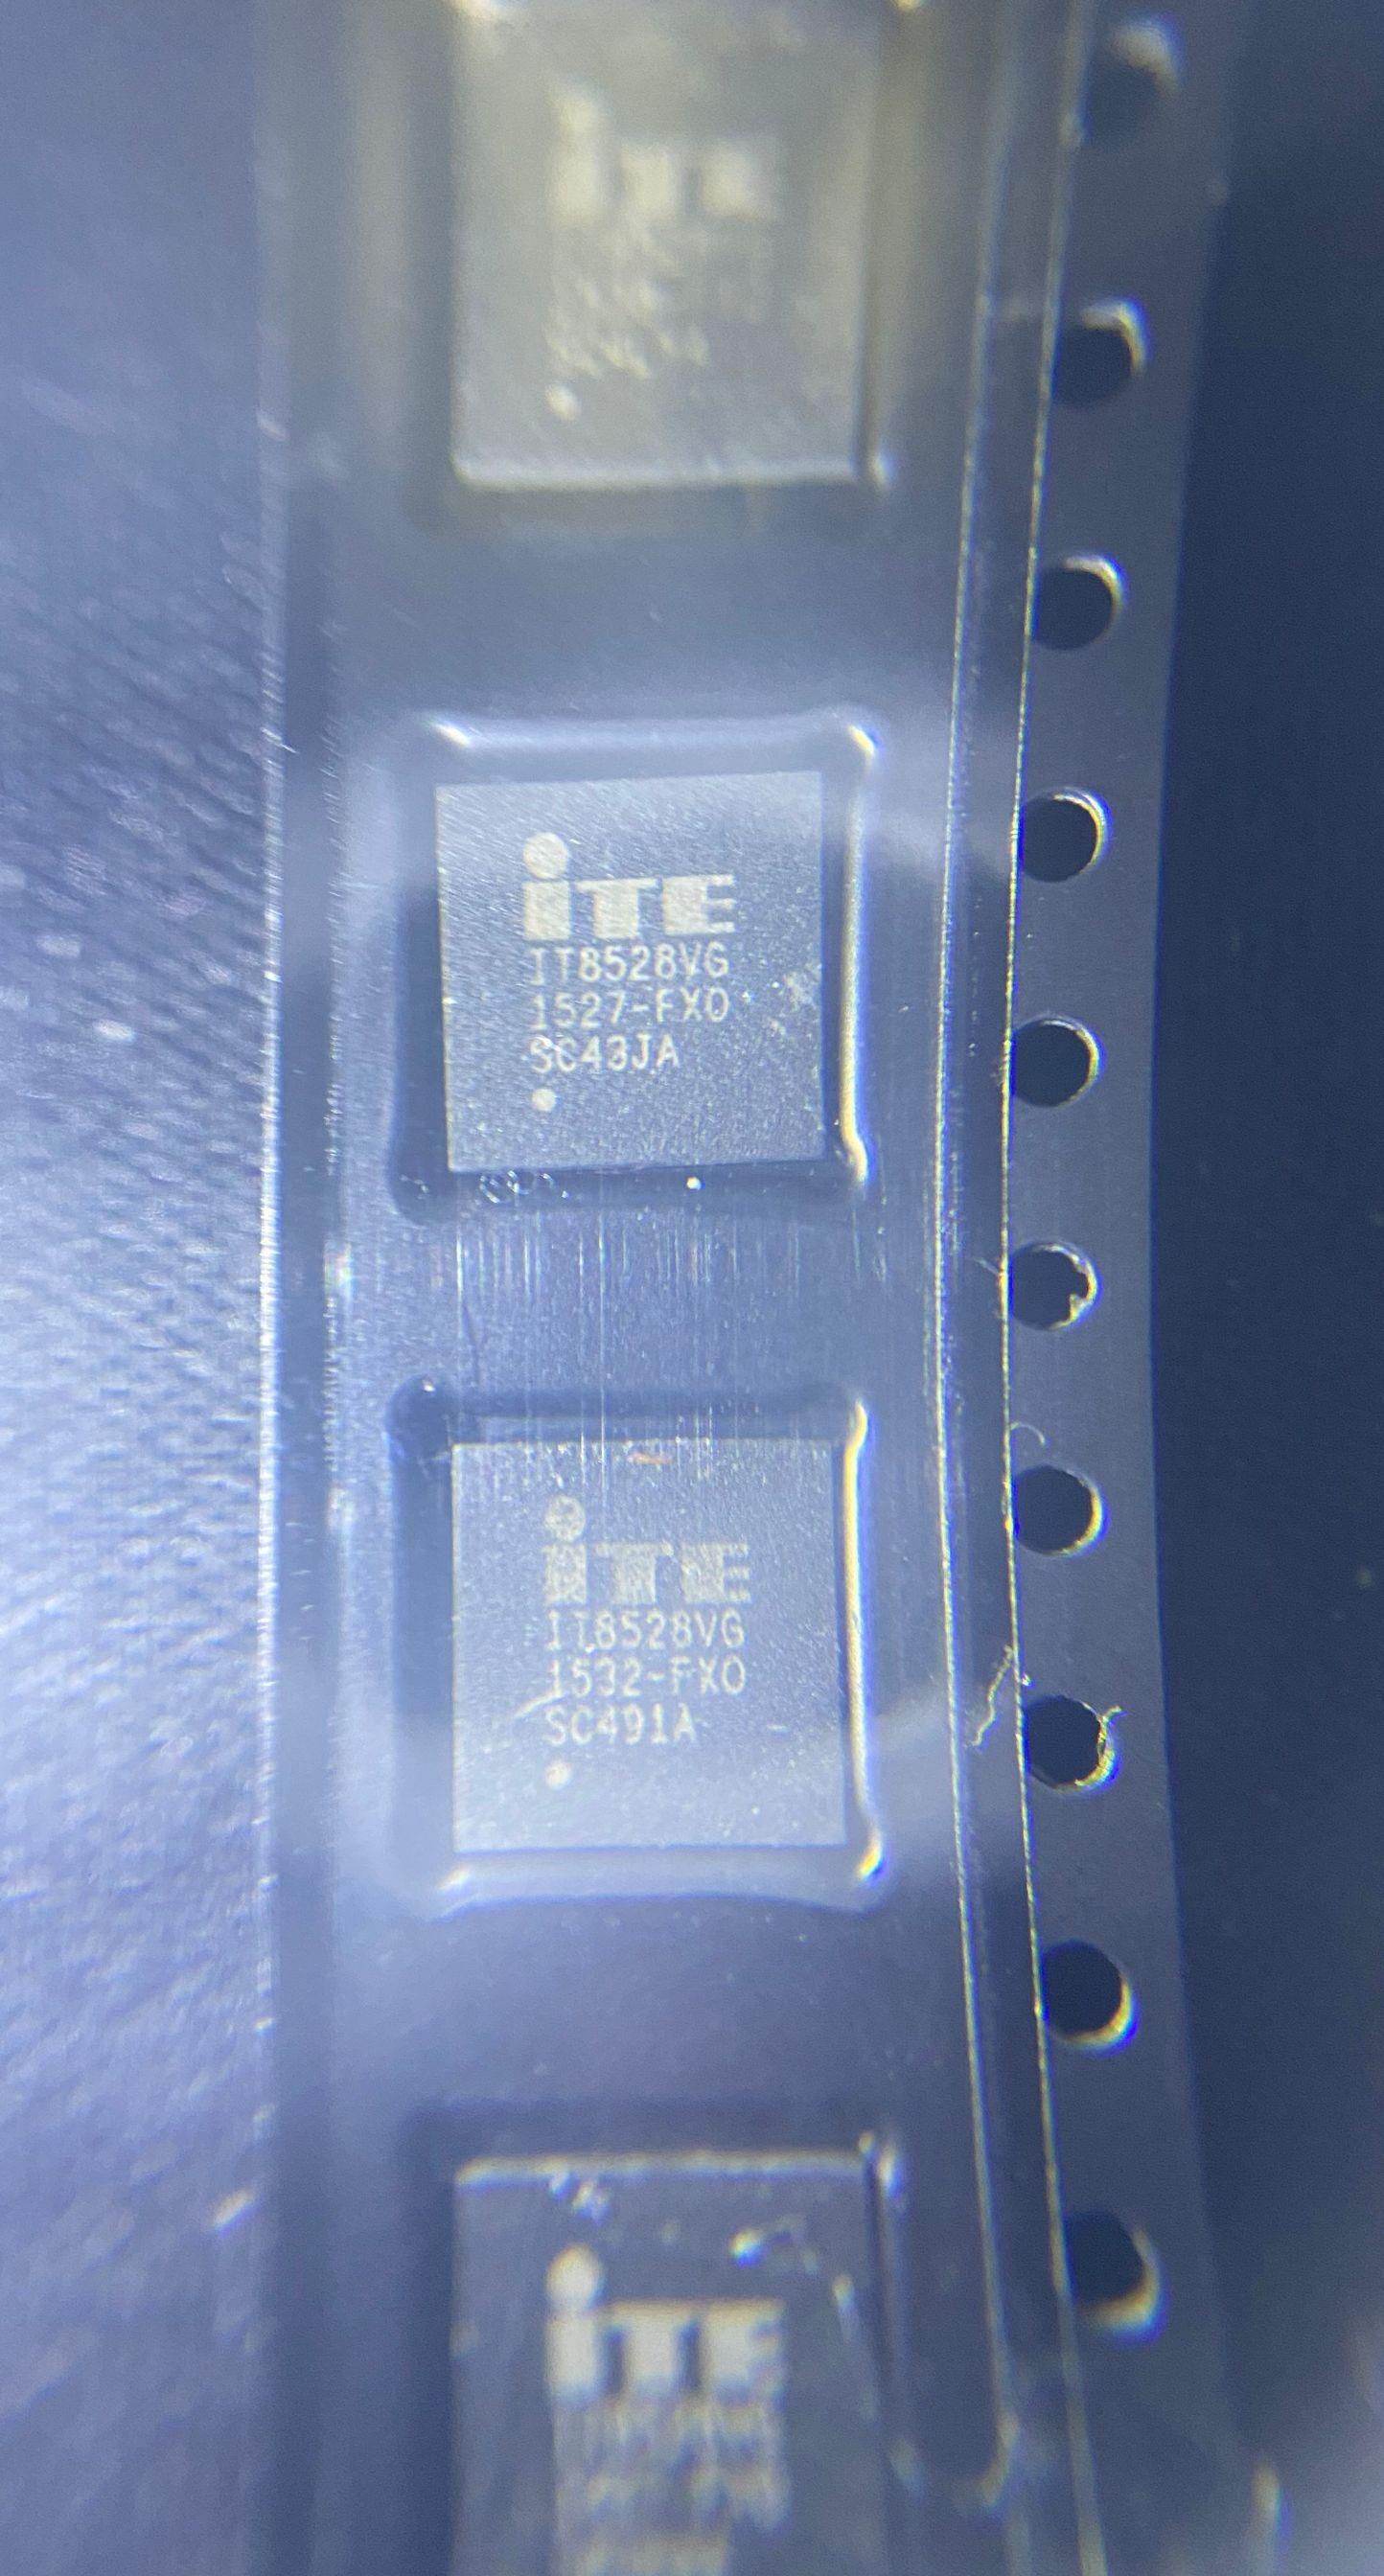 10 шт./лот IT8528VG ITE8528VG FXO BGA surface Microsoft Pro4 boot EC совершенно новый